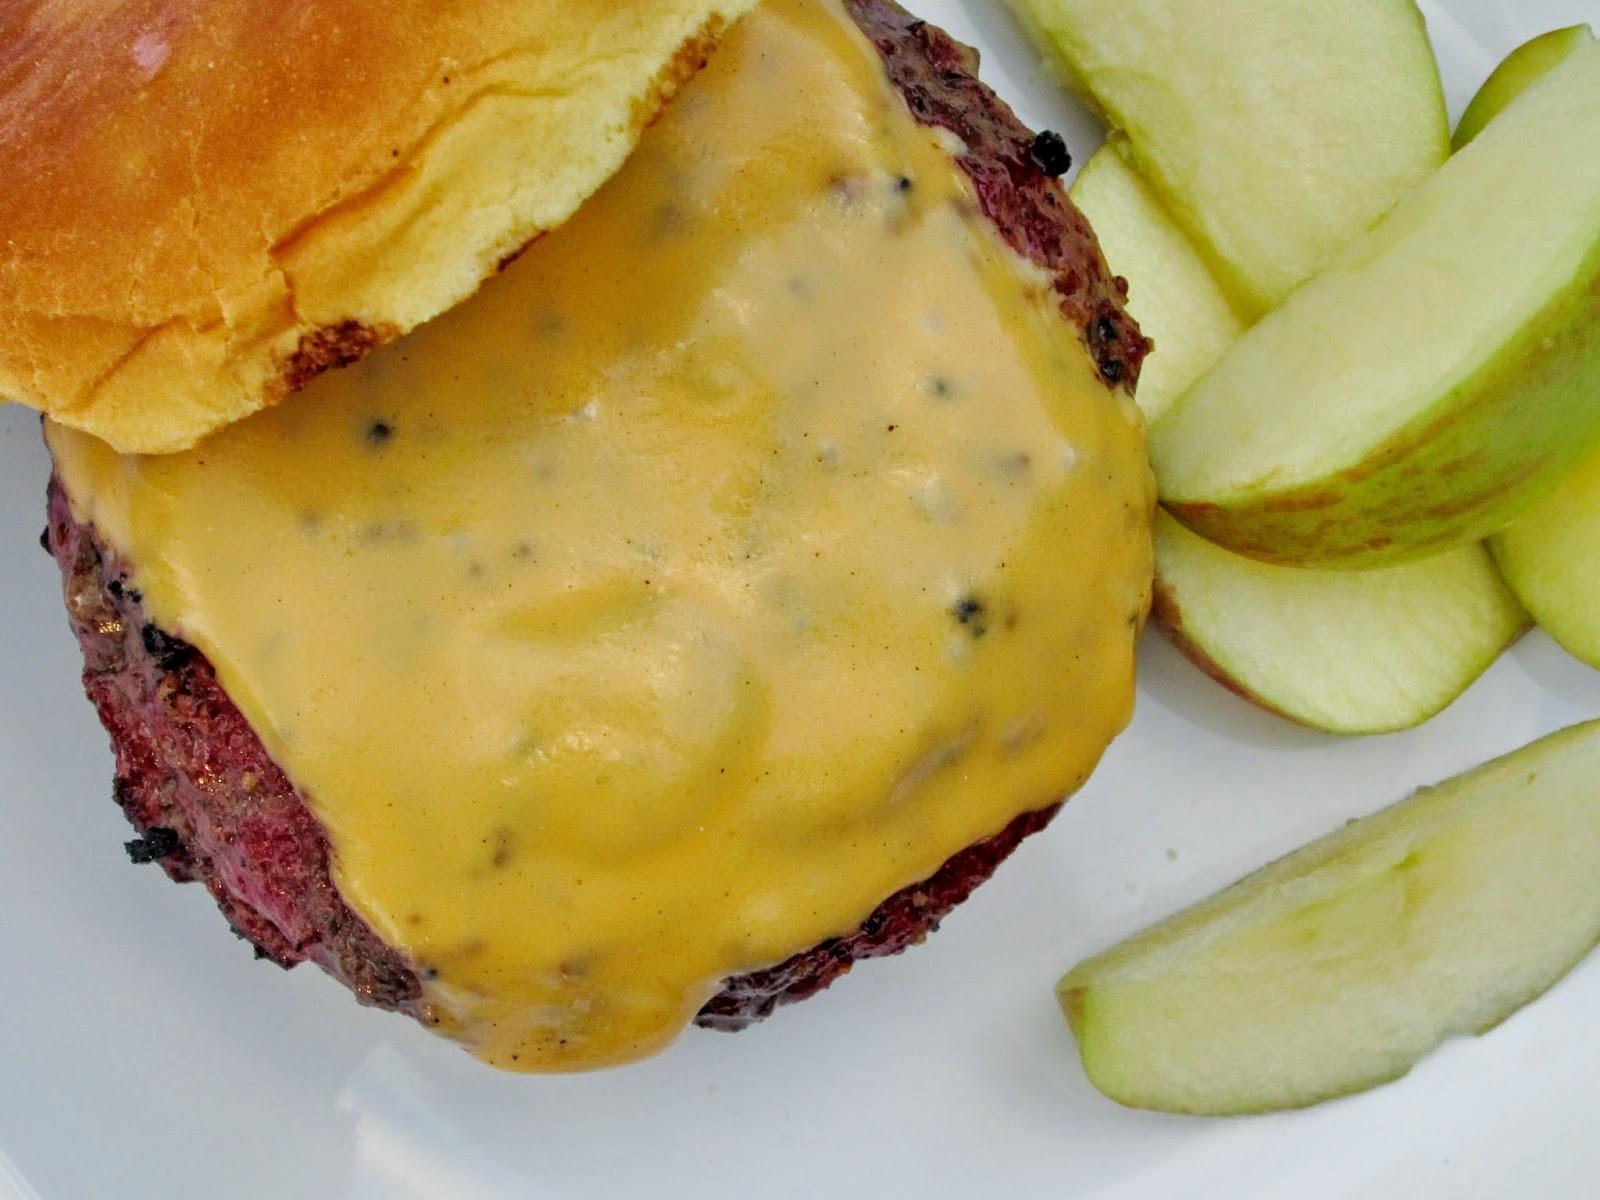 #saycheeseburger #collectivebias #cbias #shop